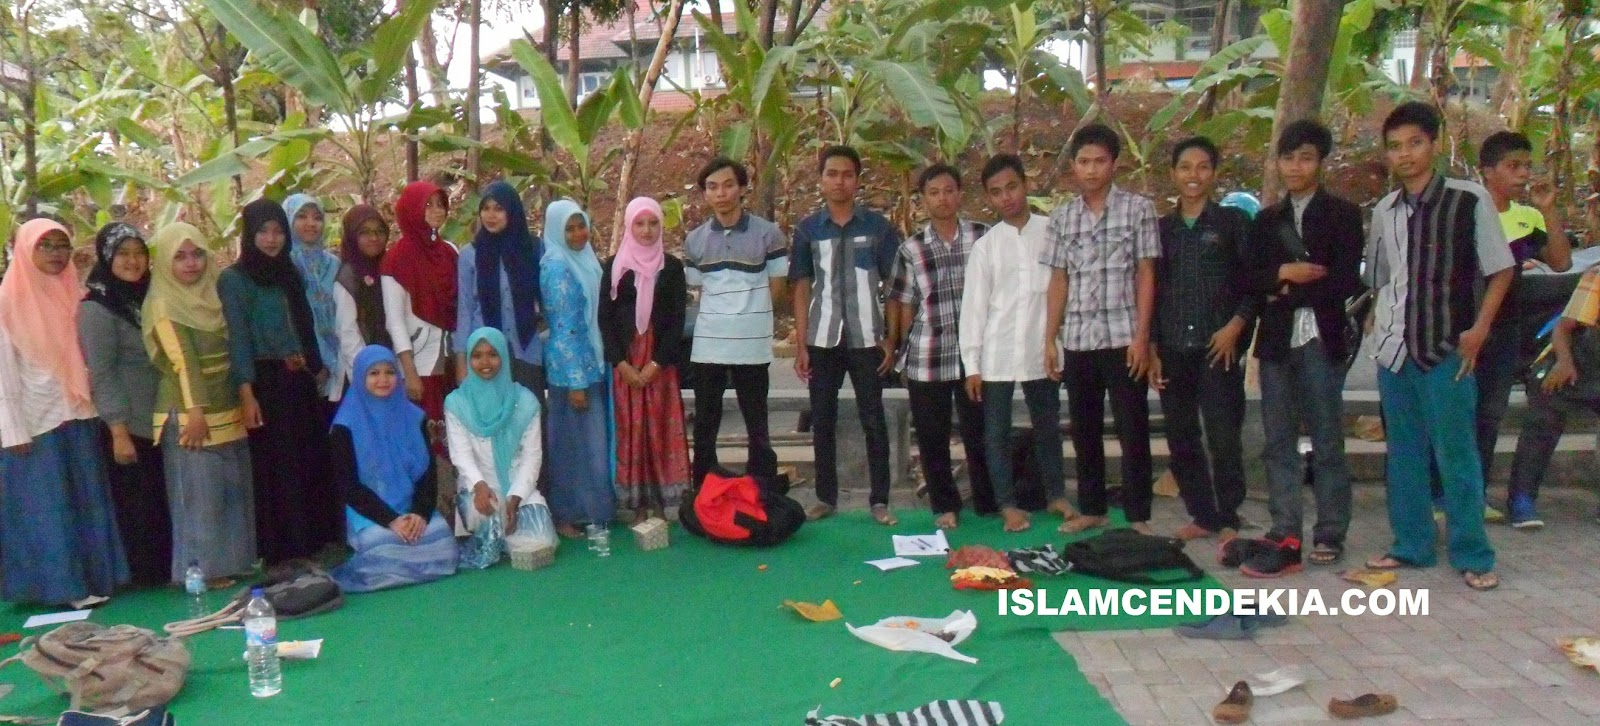 Himpunan Mahasiswa Islam Komisariat Tarbiyah Gelar Diskusi Kurikulum 2013